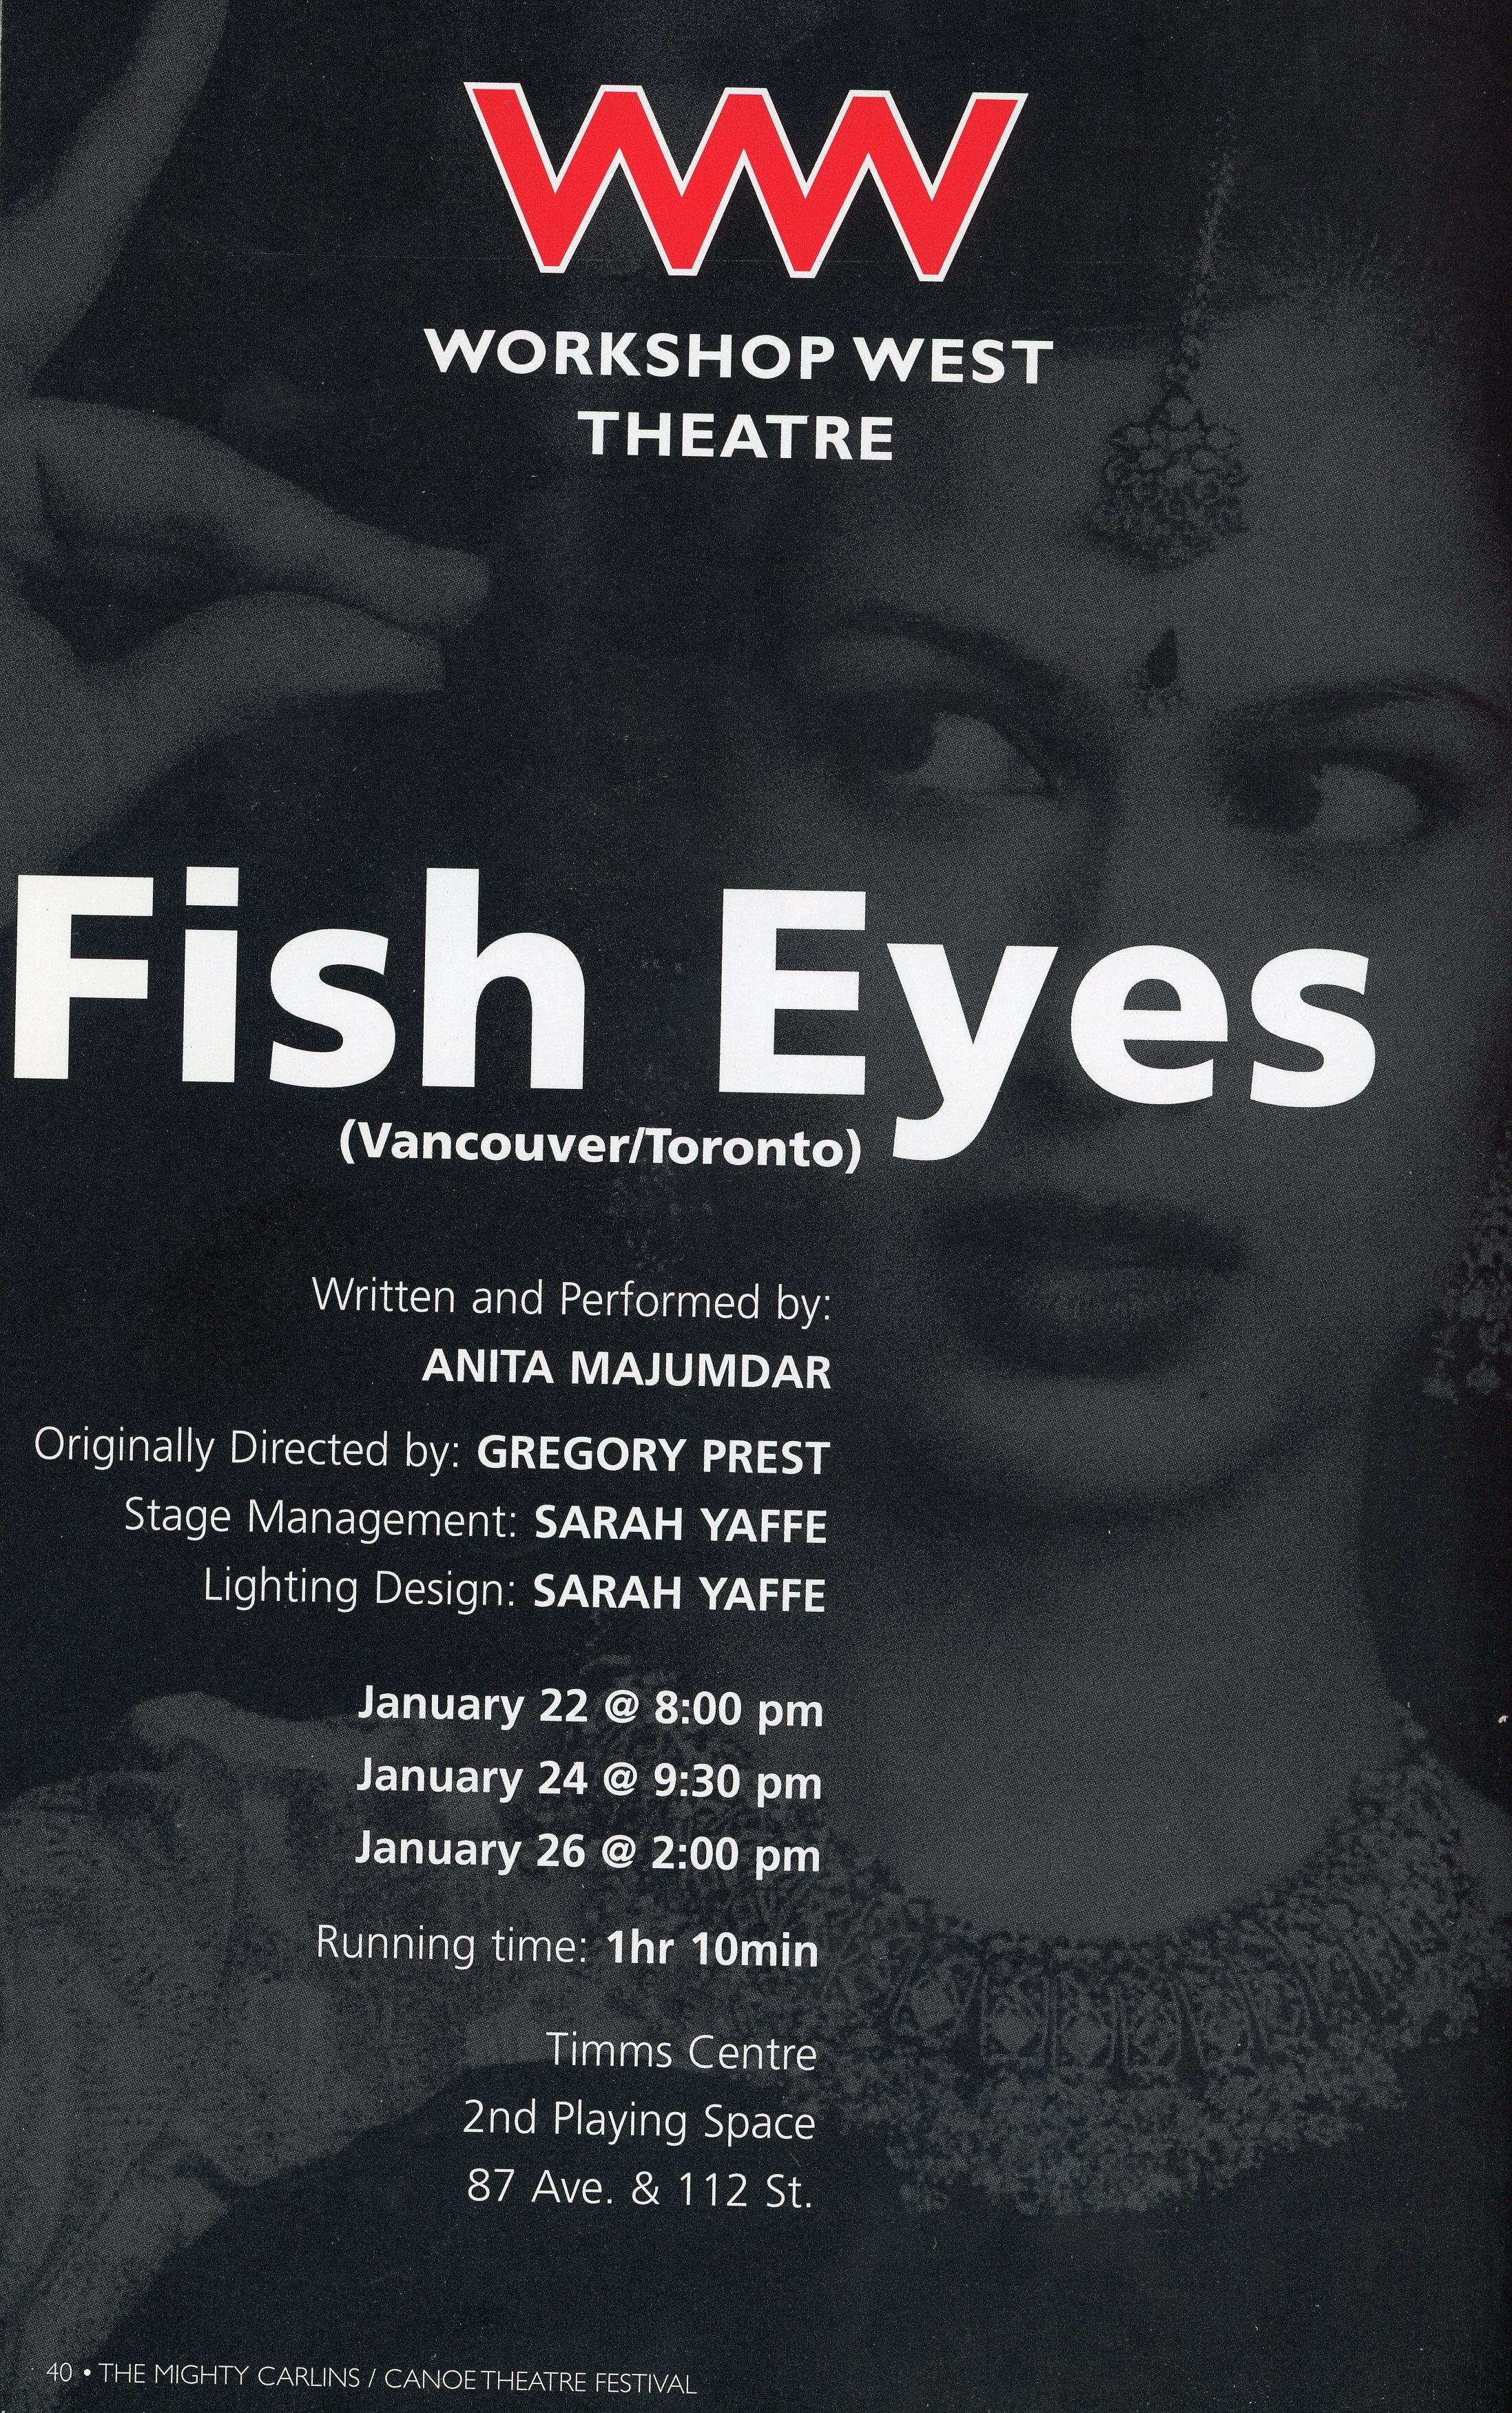 Workshop West Theatre (2008)-Production Information-Fish Eye_JPEG.jpg